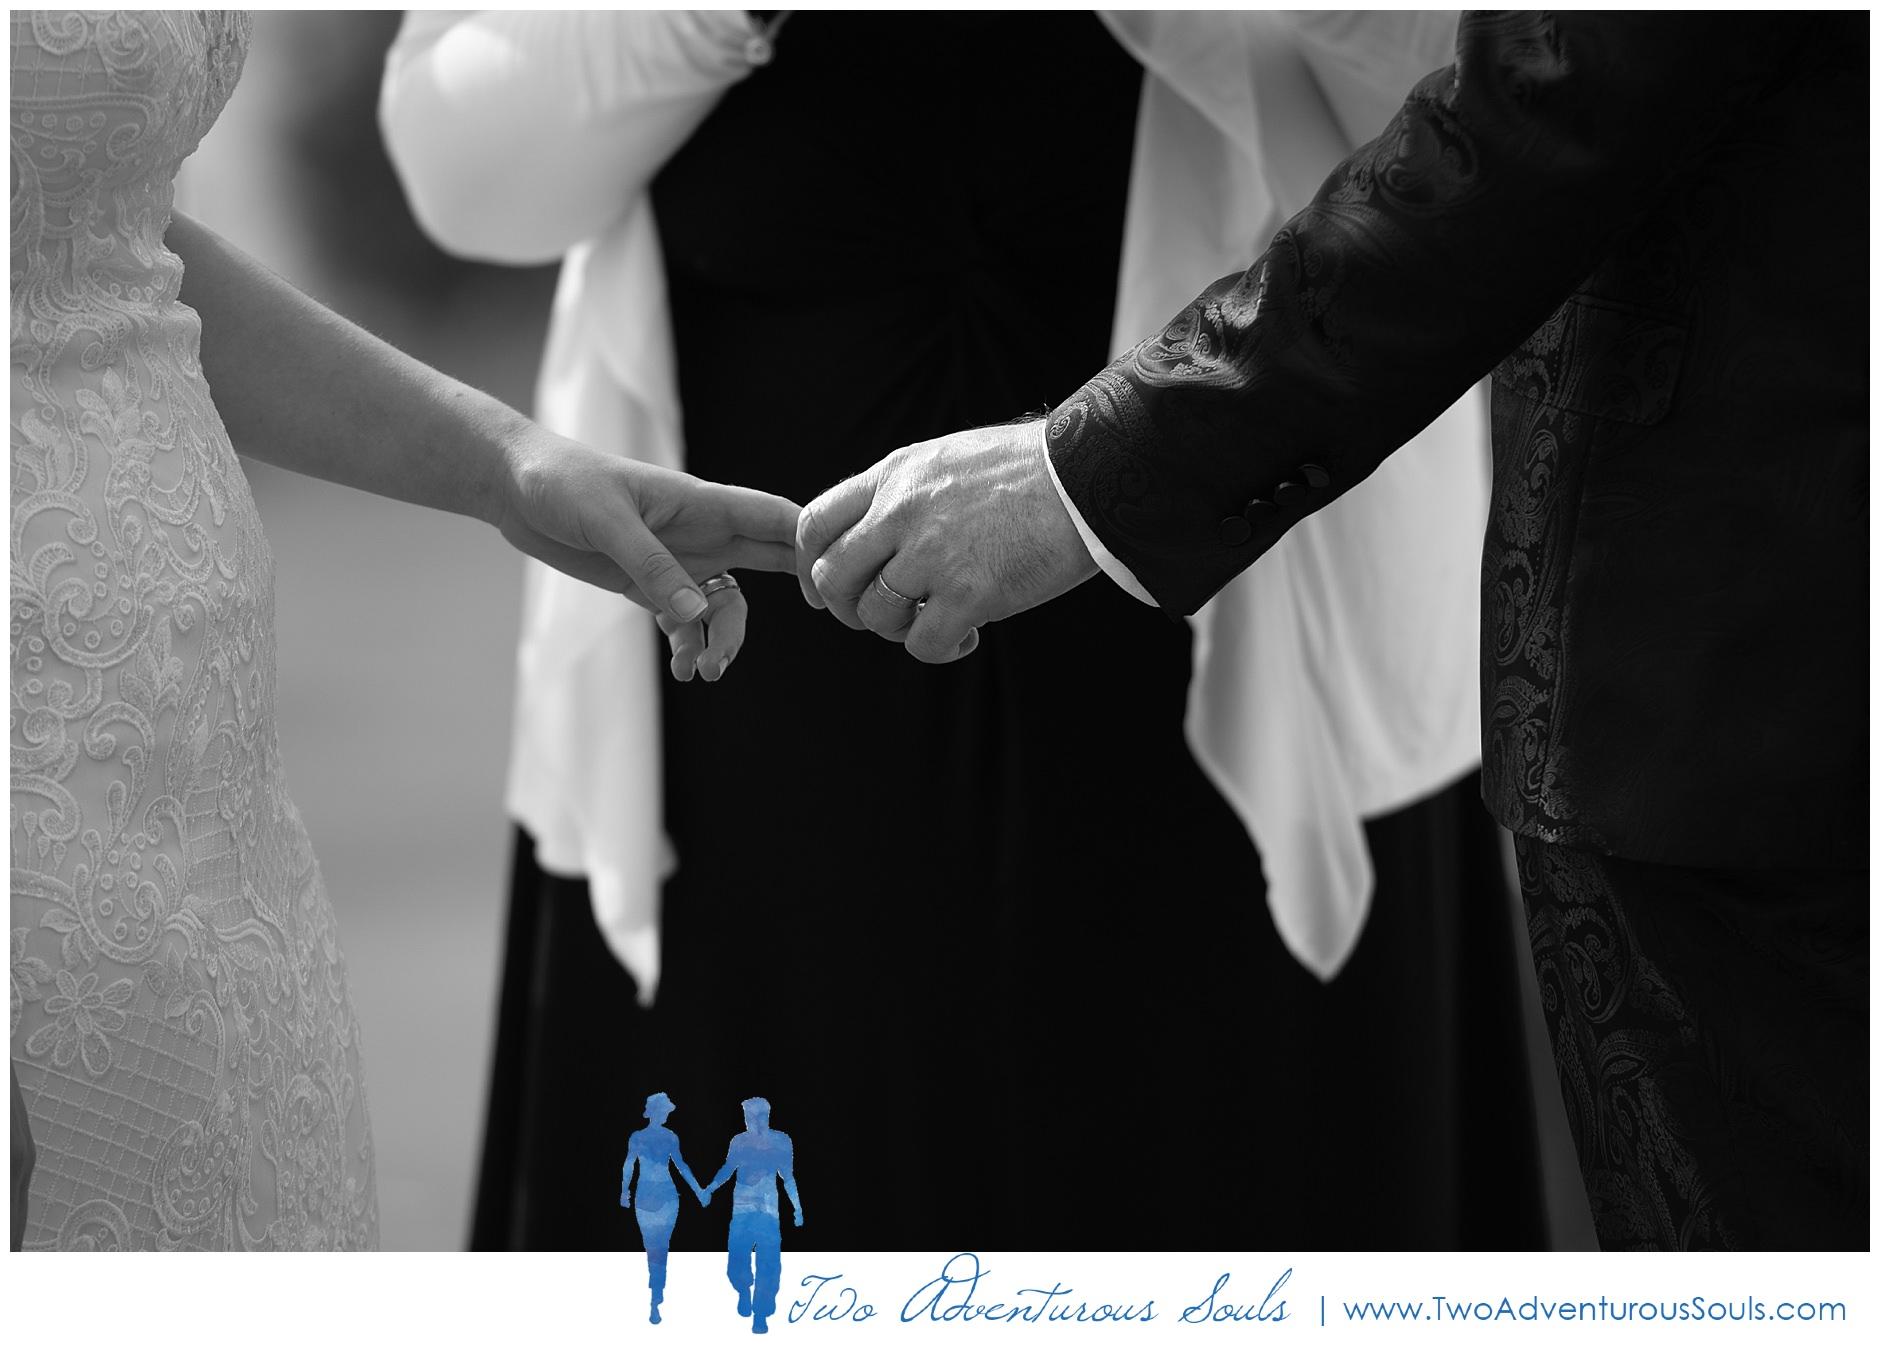 Chebeague Island Inn Wedding Photograpehrs, Maine Wedding Photographers, Two Adventurous Souls-082419_0006.jpg